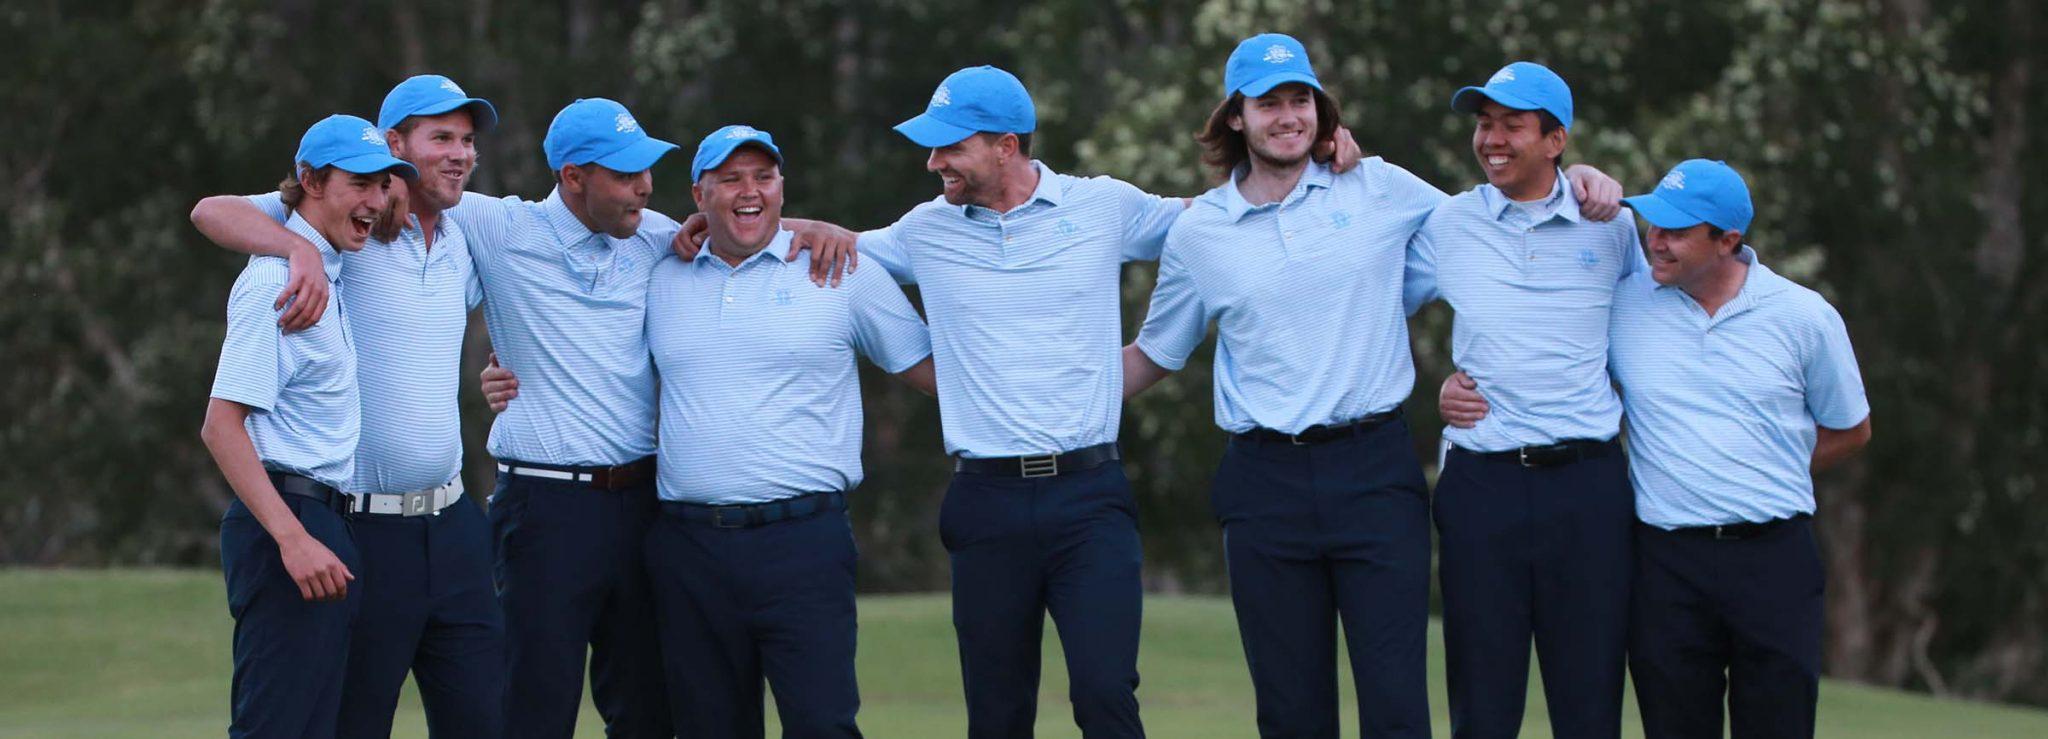 NSW Major Pennant team celebrate